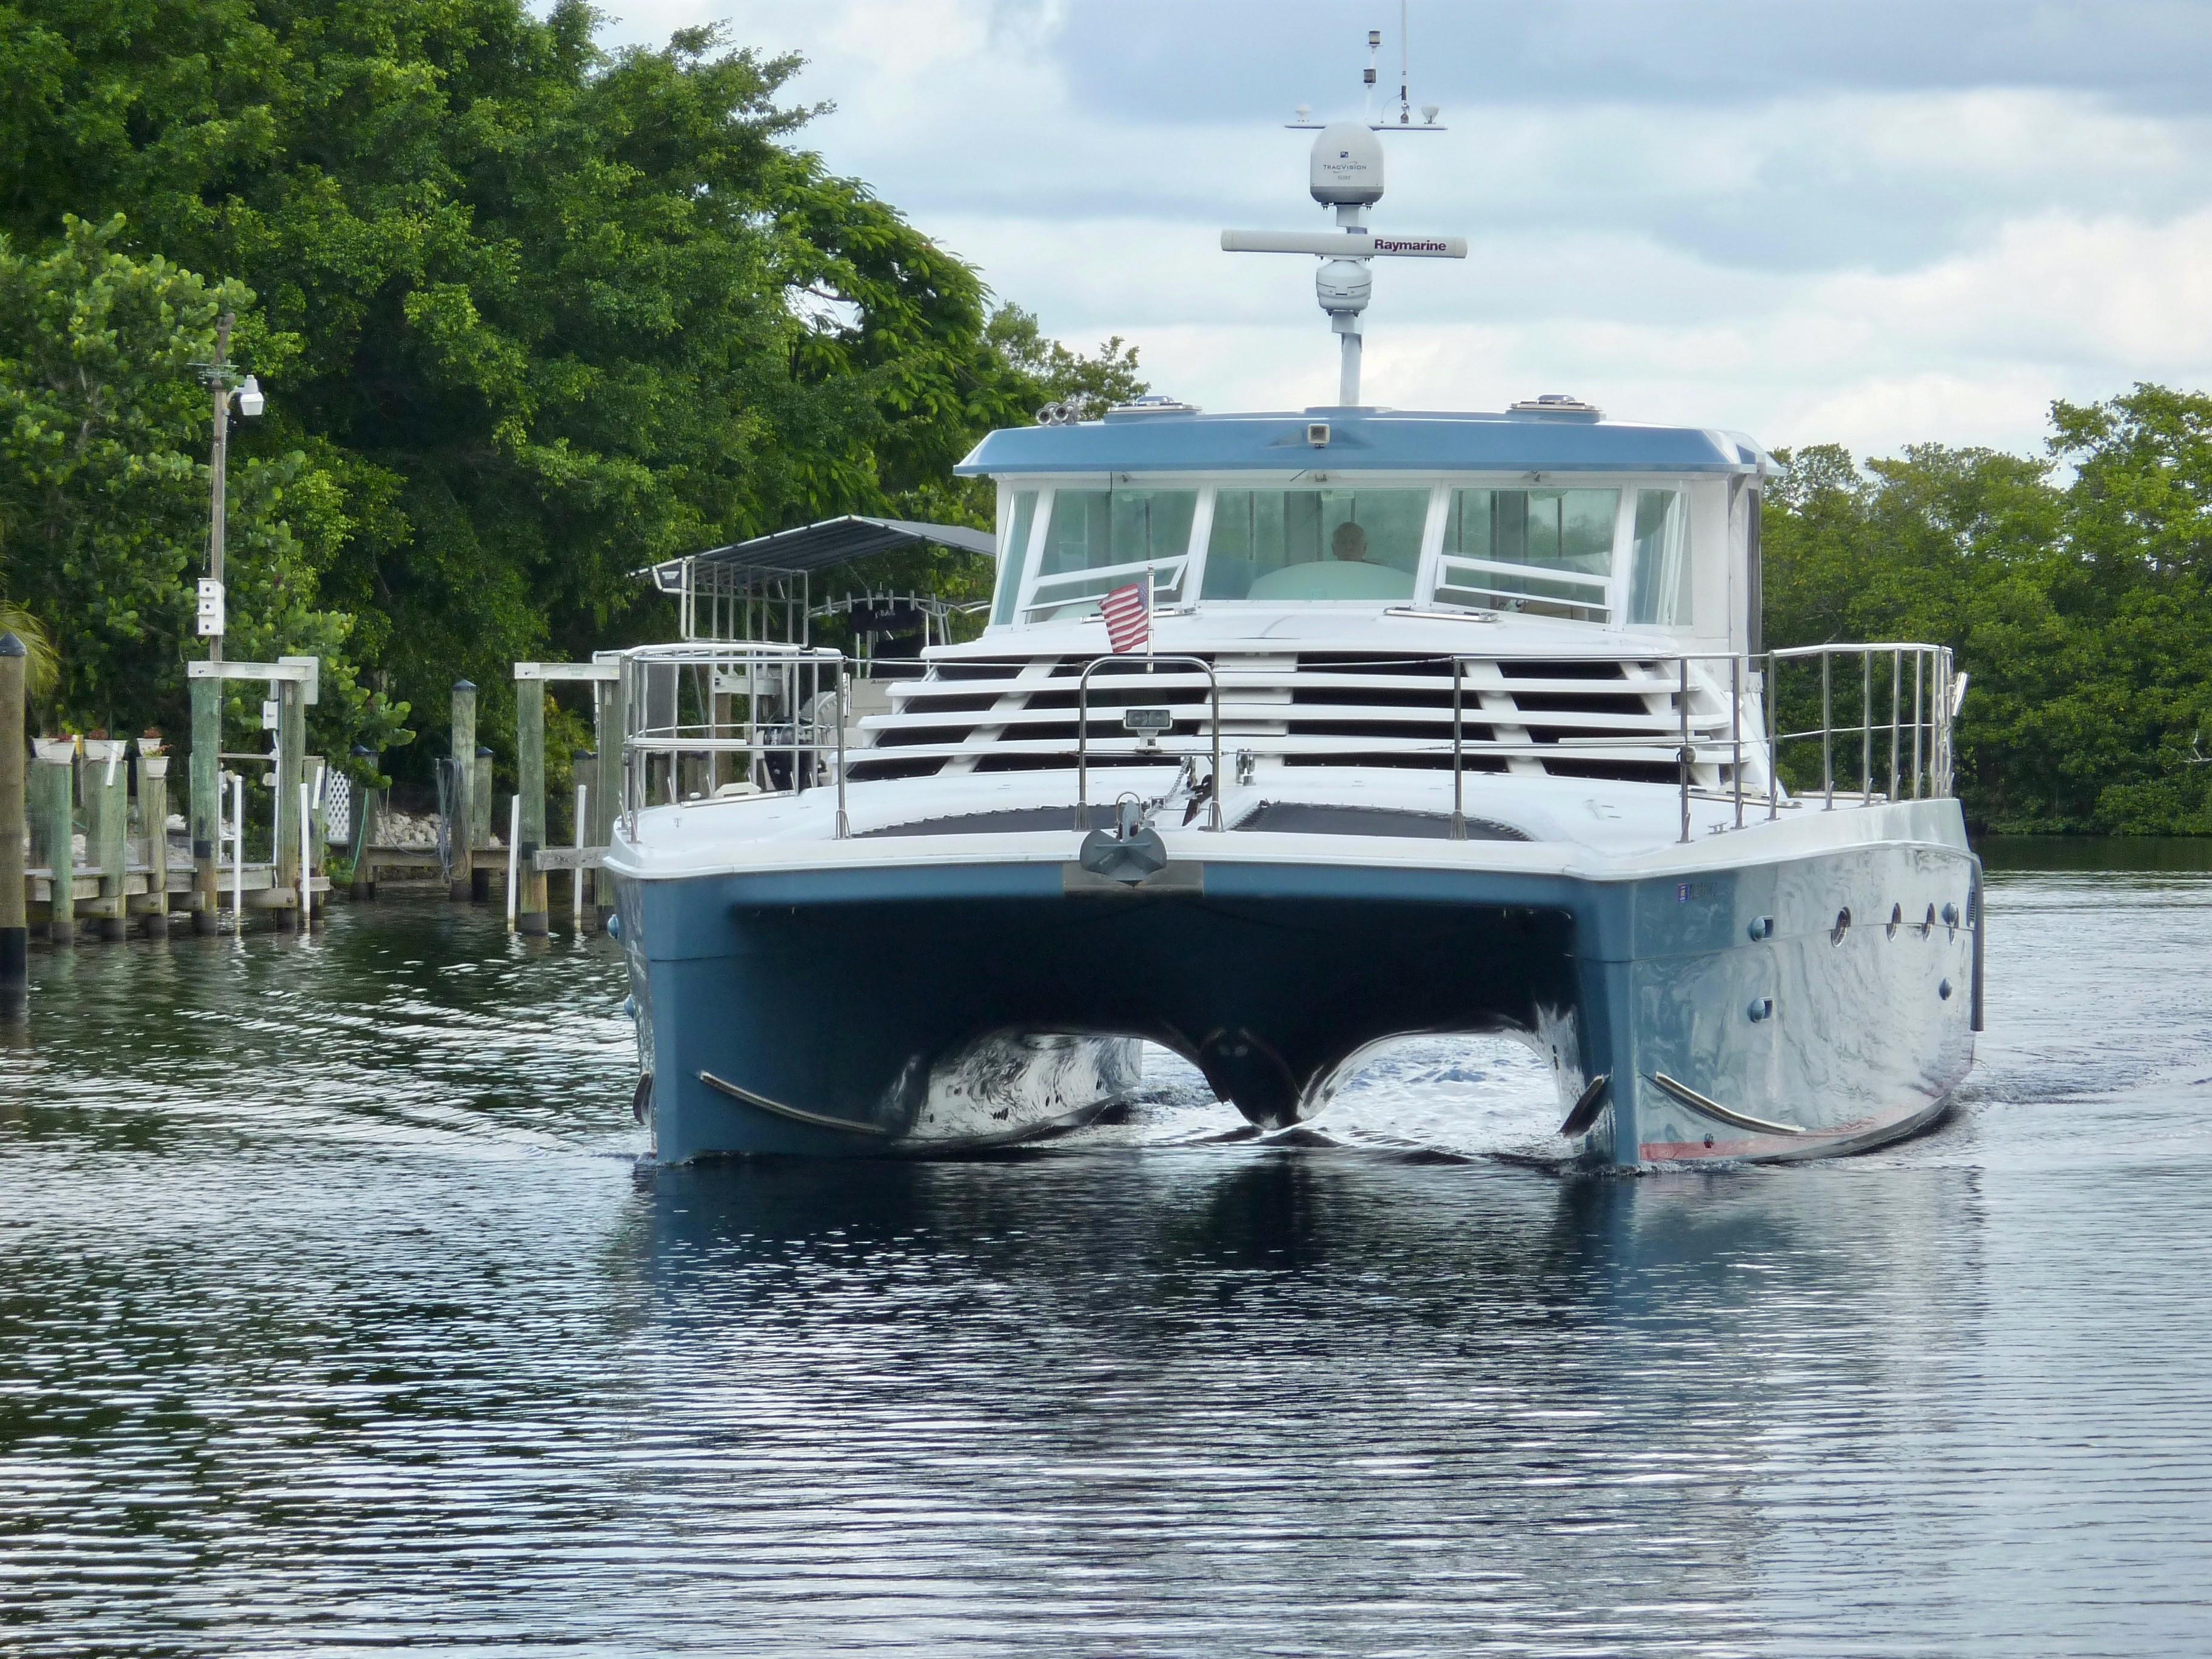 Volvo Of Bonita Springs >> Sea Rose Manta 2007 44 Power Cat 44 Yacht for Sale in US